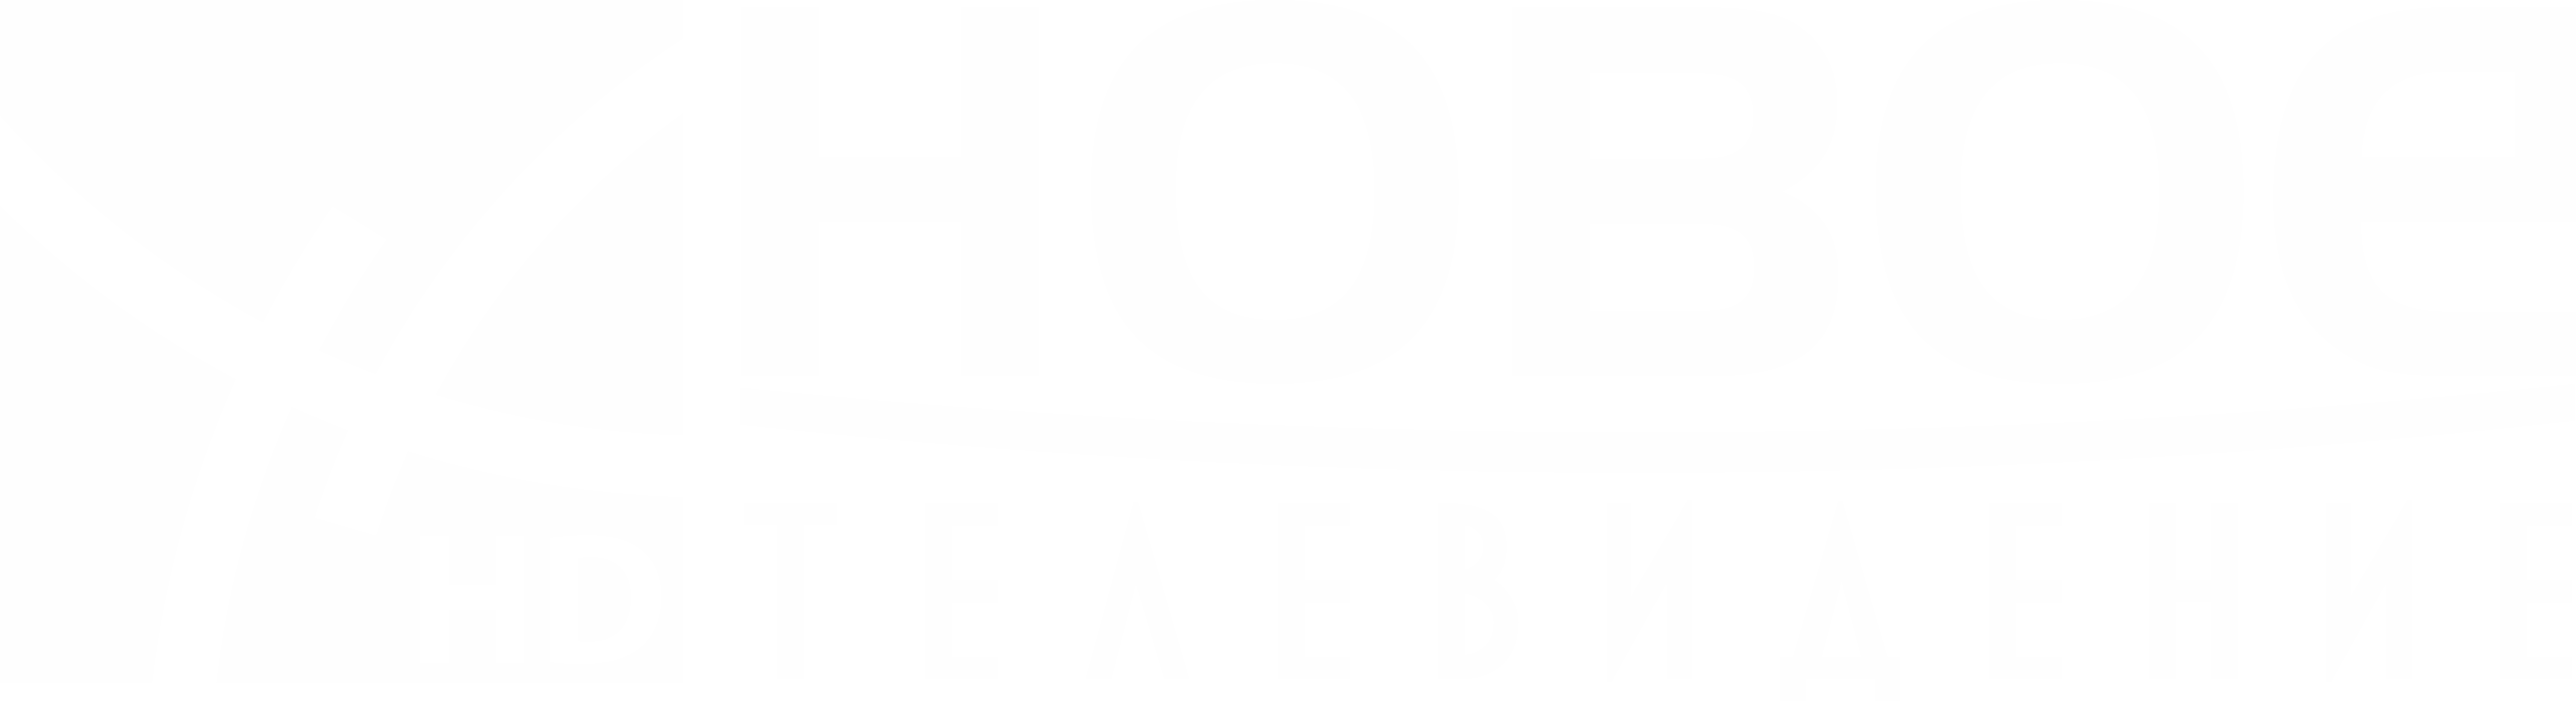 almatitvnews